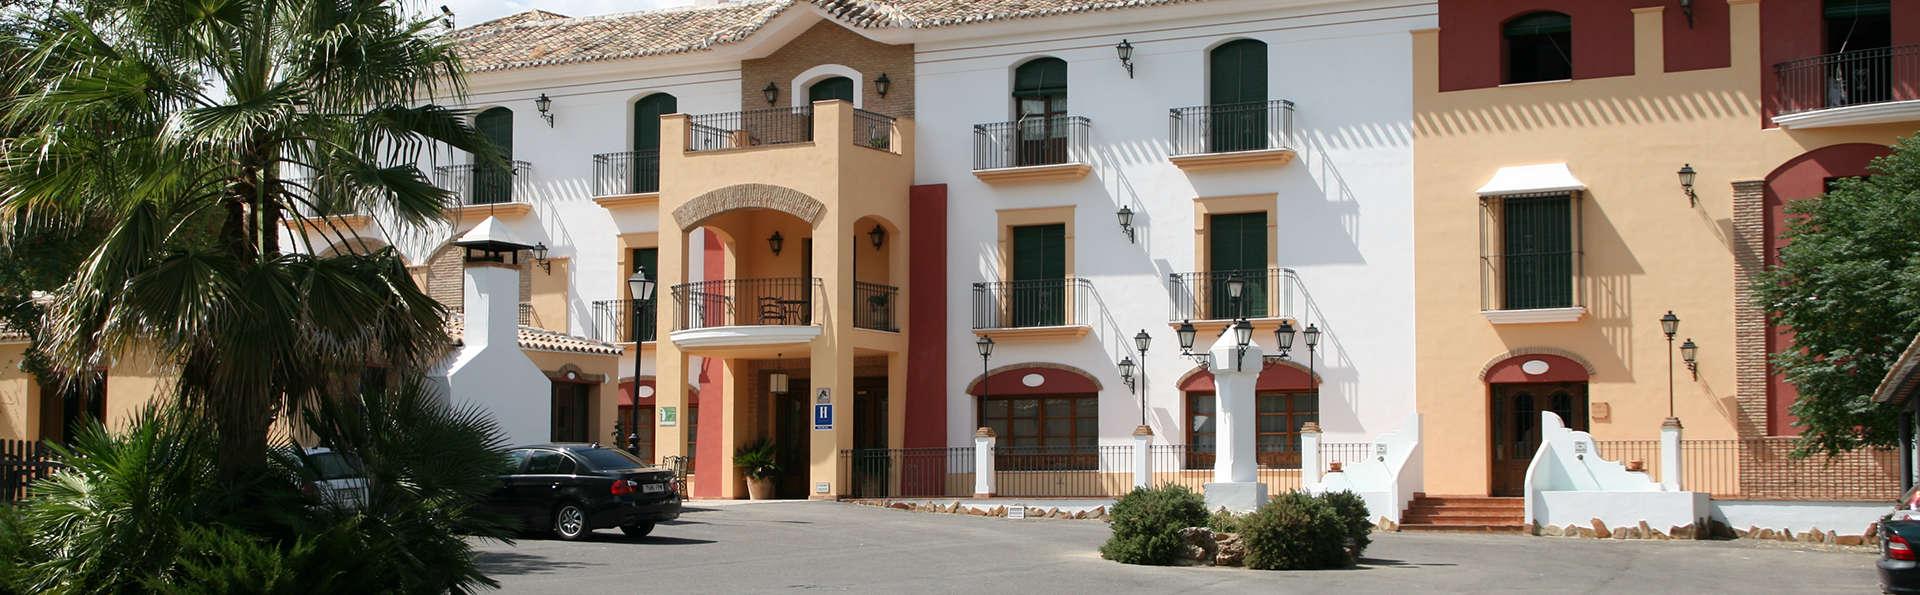 Hotel Huerta de las Palomas - EDIT_front.jpg